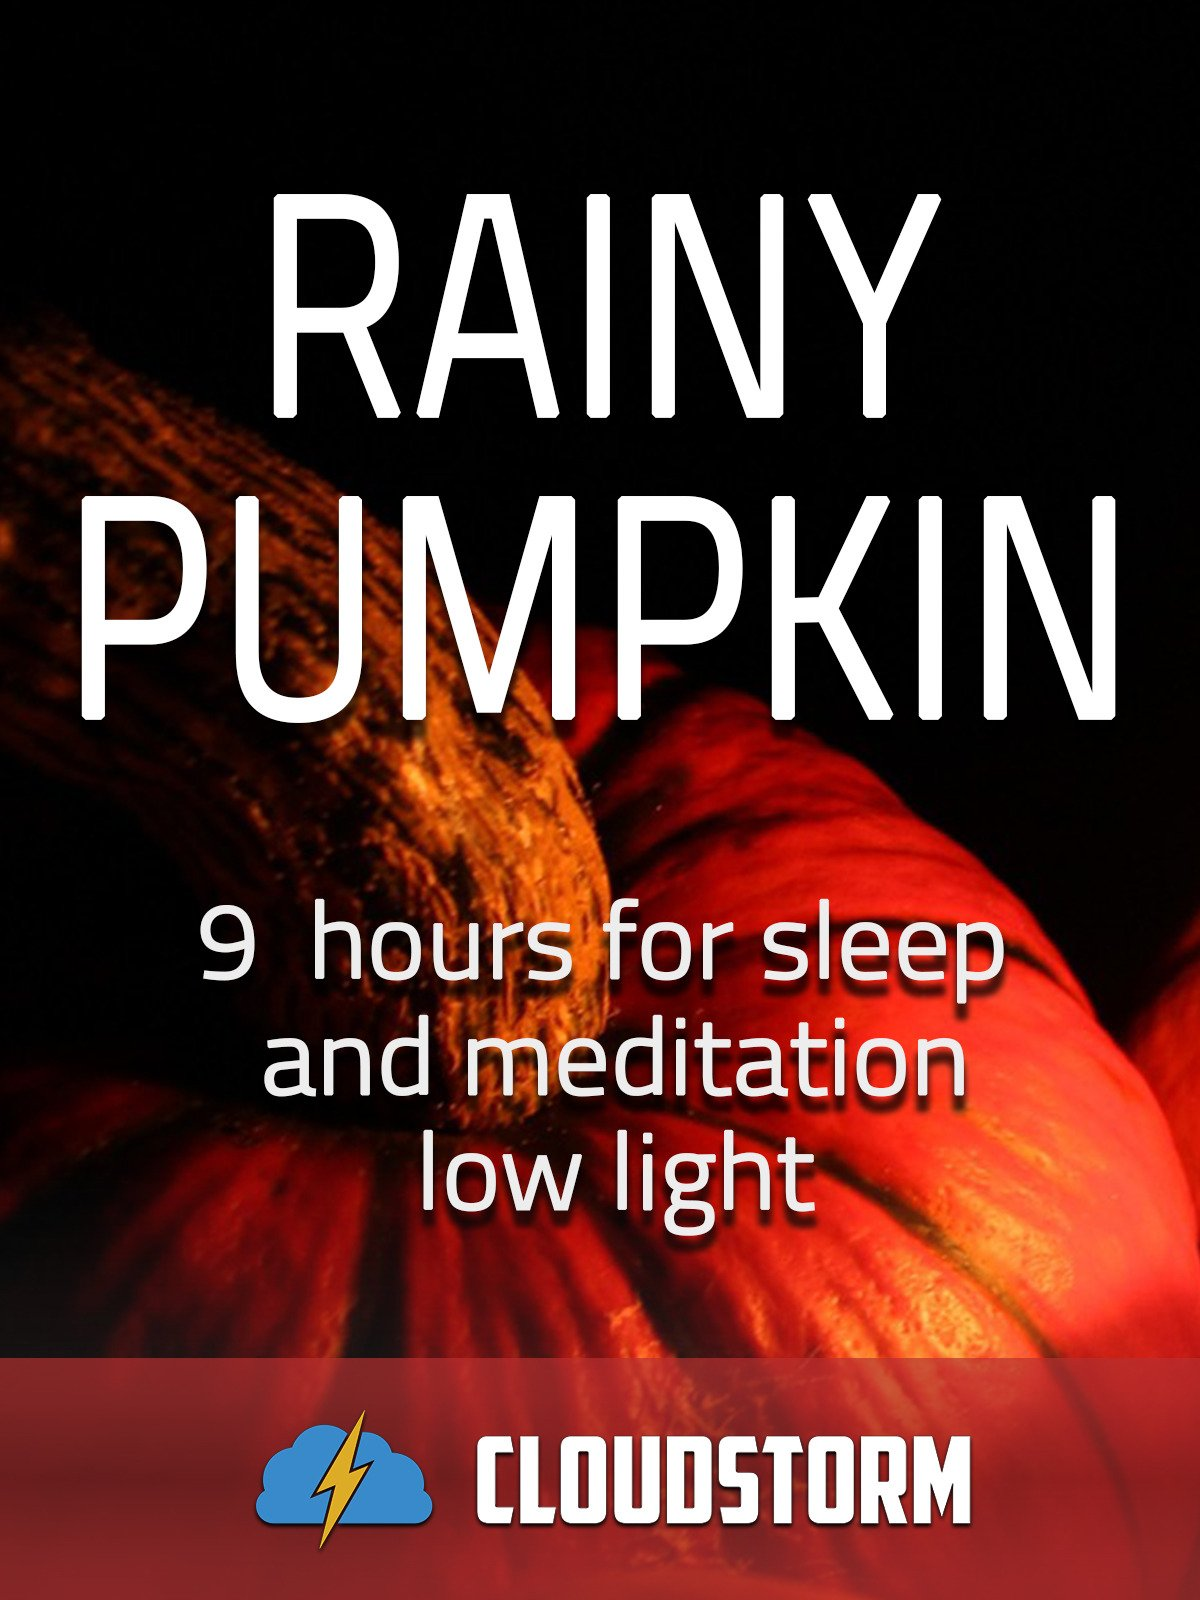 Rainy pumpkin, 9 hours for Sleep and Meditation, low light